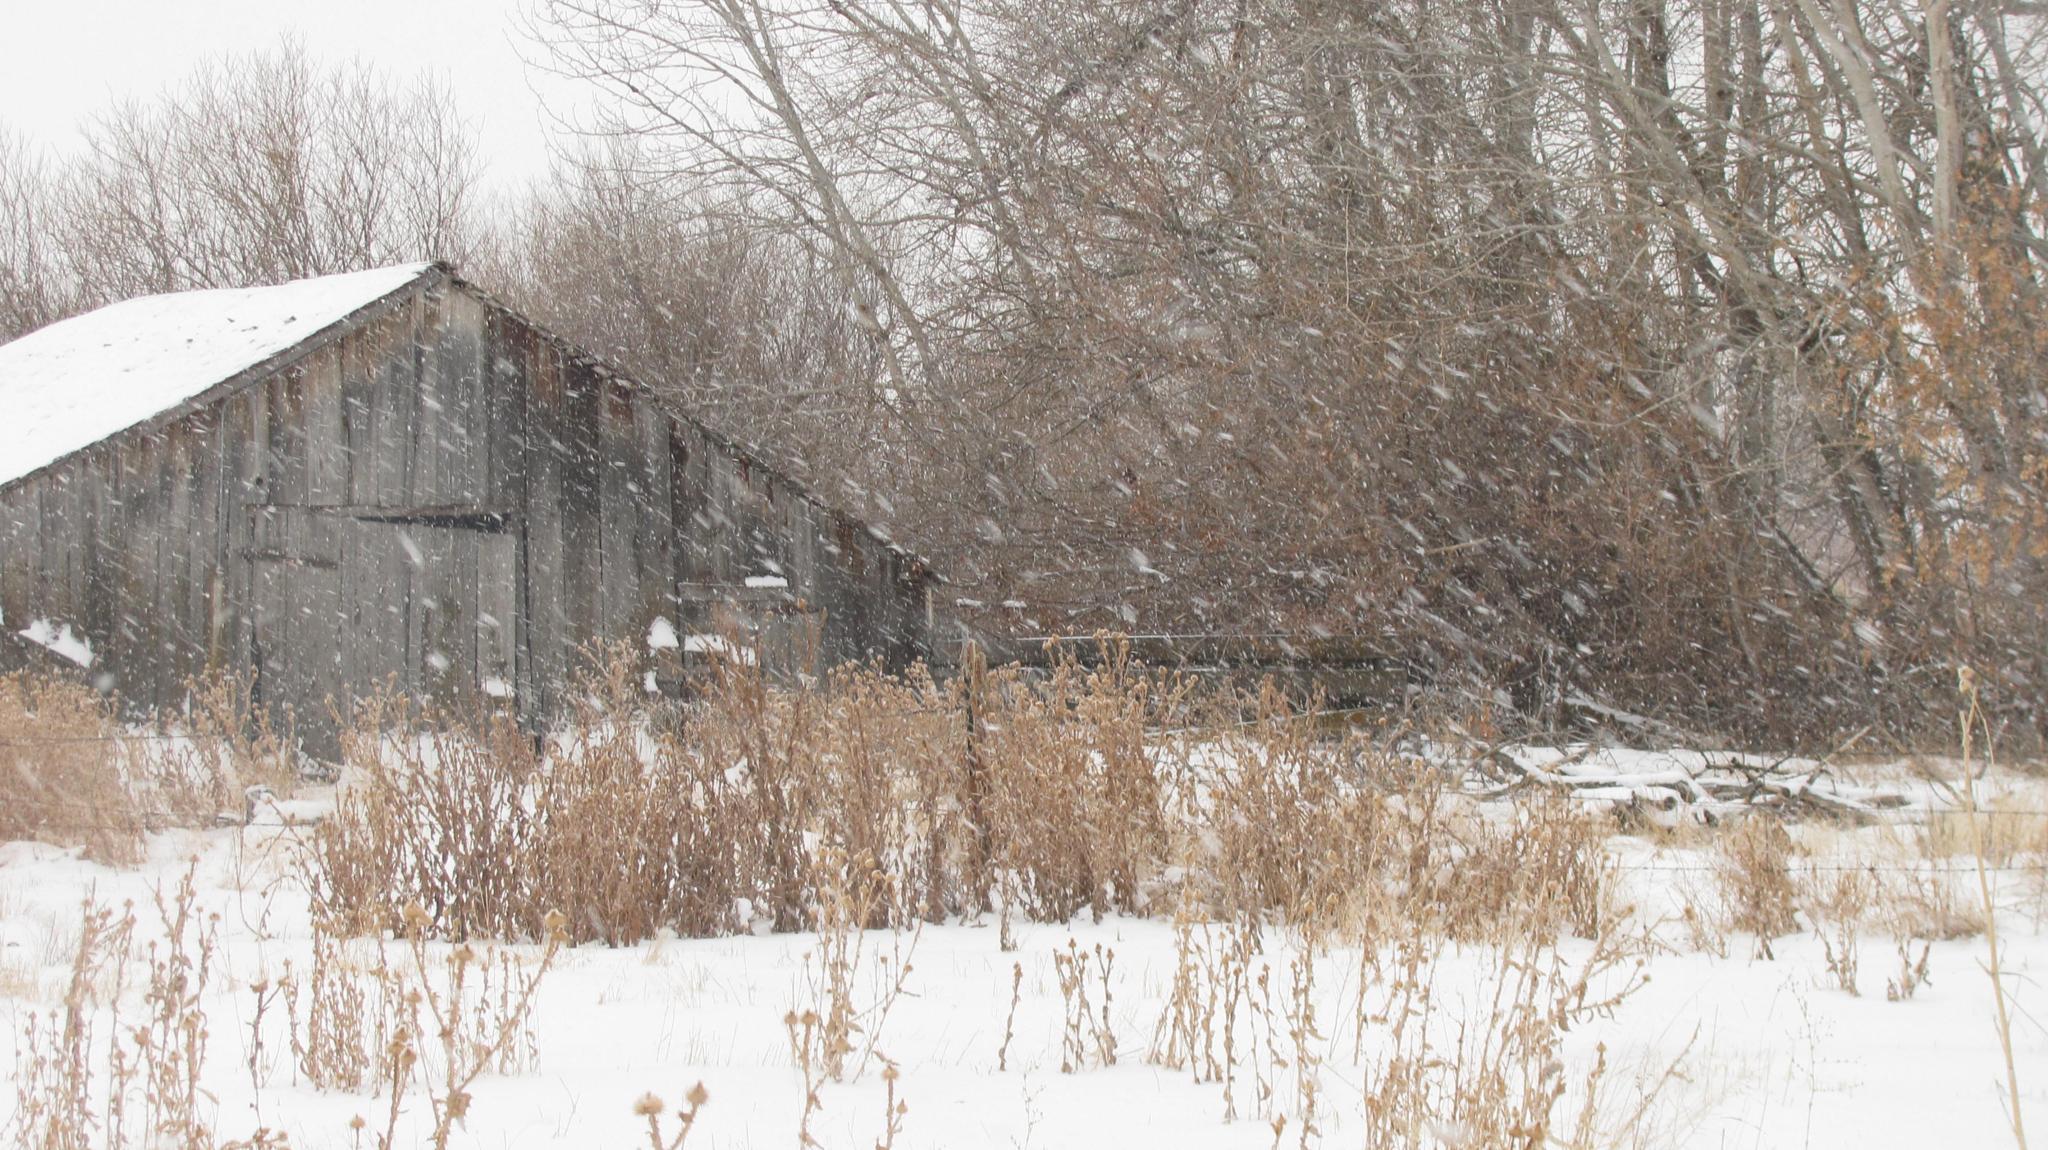 Old Milkbarn-Winter by peteyfoozer1